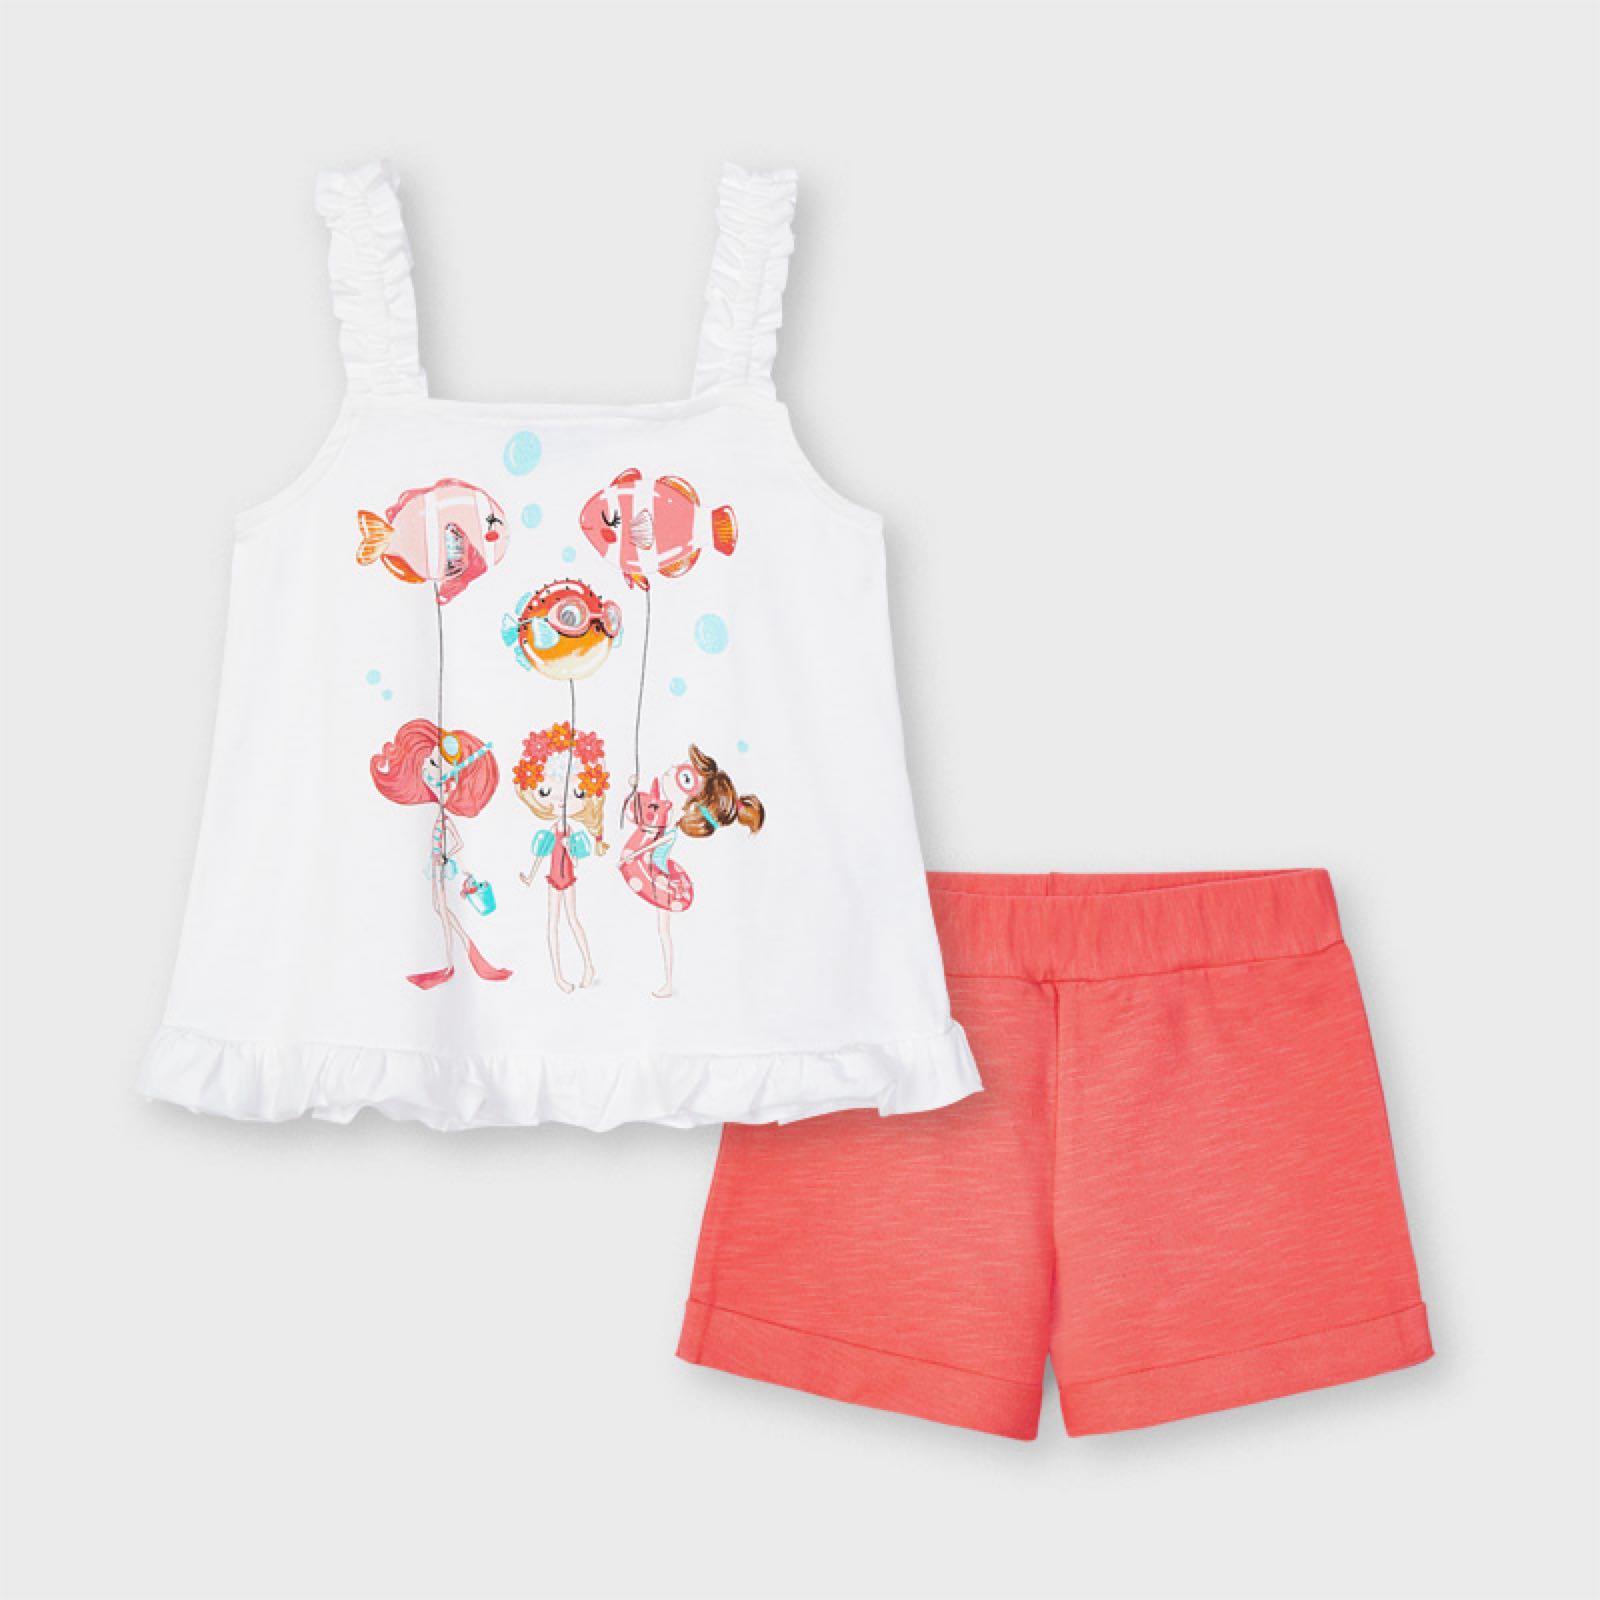 MAYORAL GIRLS Knit Shorts Set with Shirt 3219-51